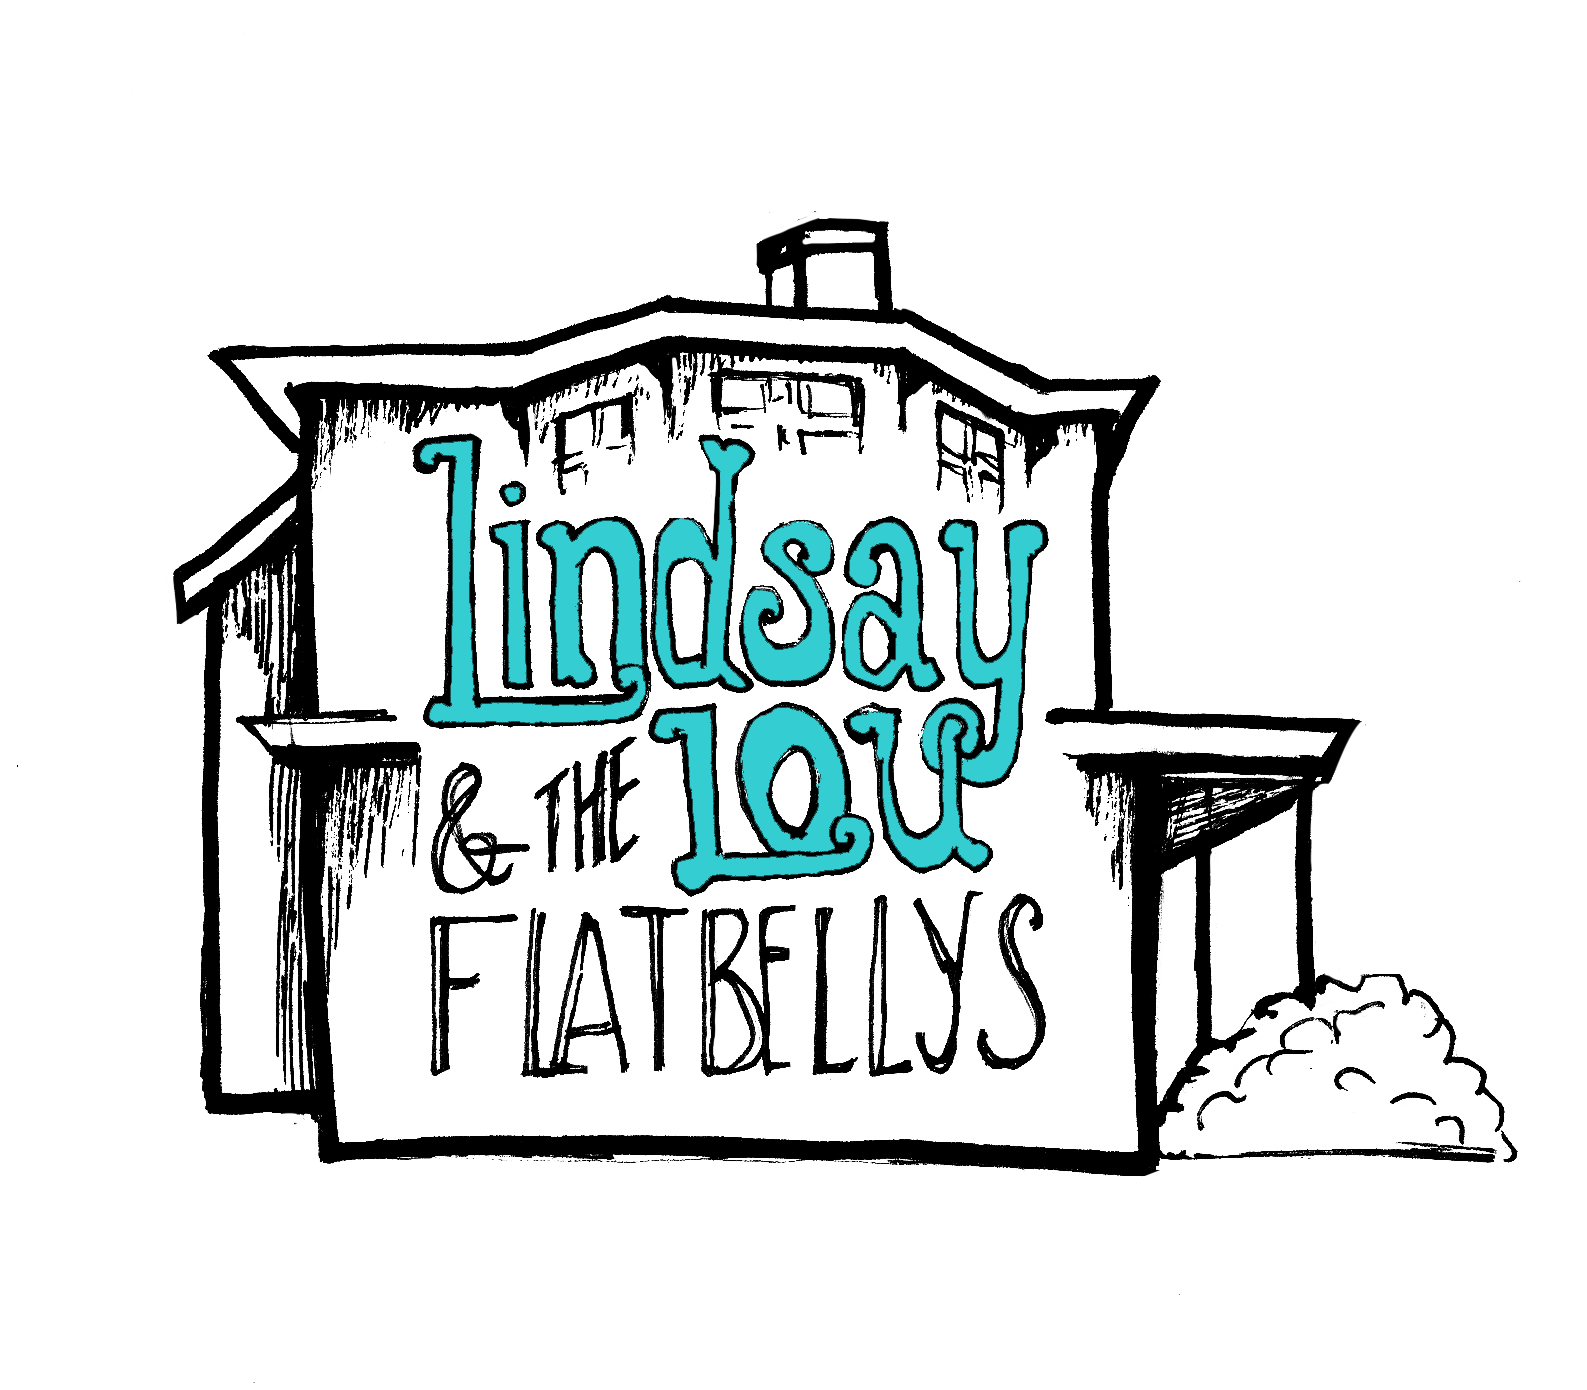 lindsay lou2.png